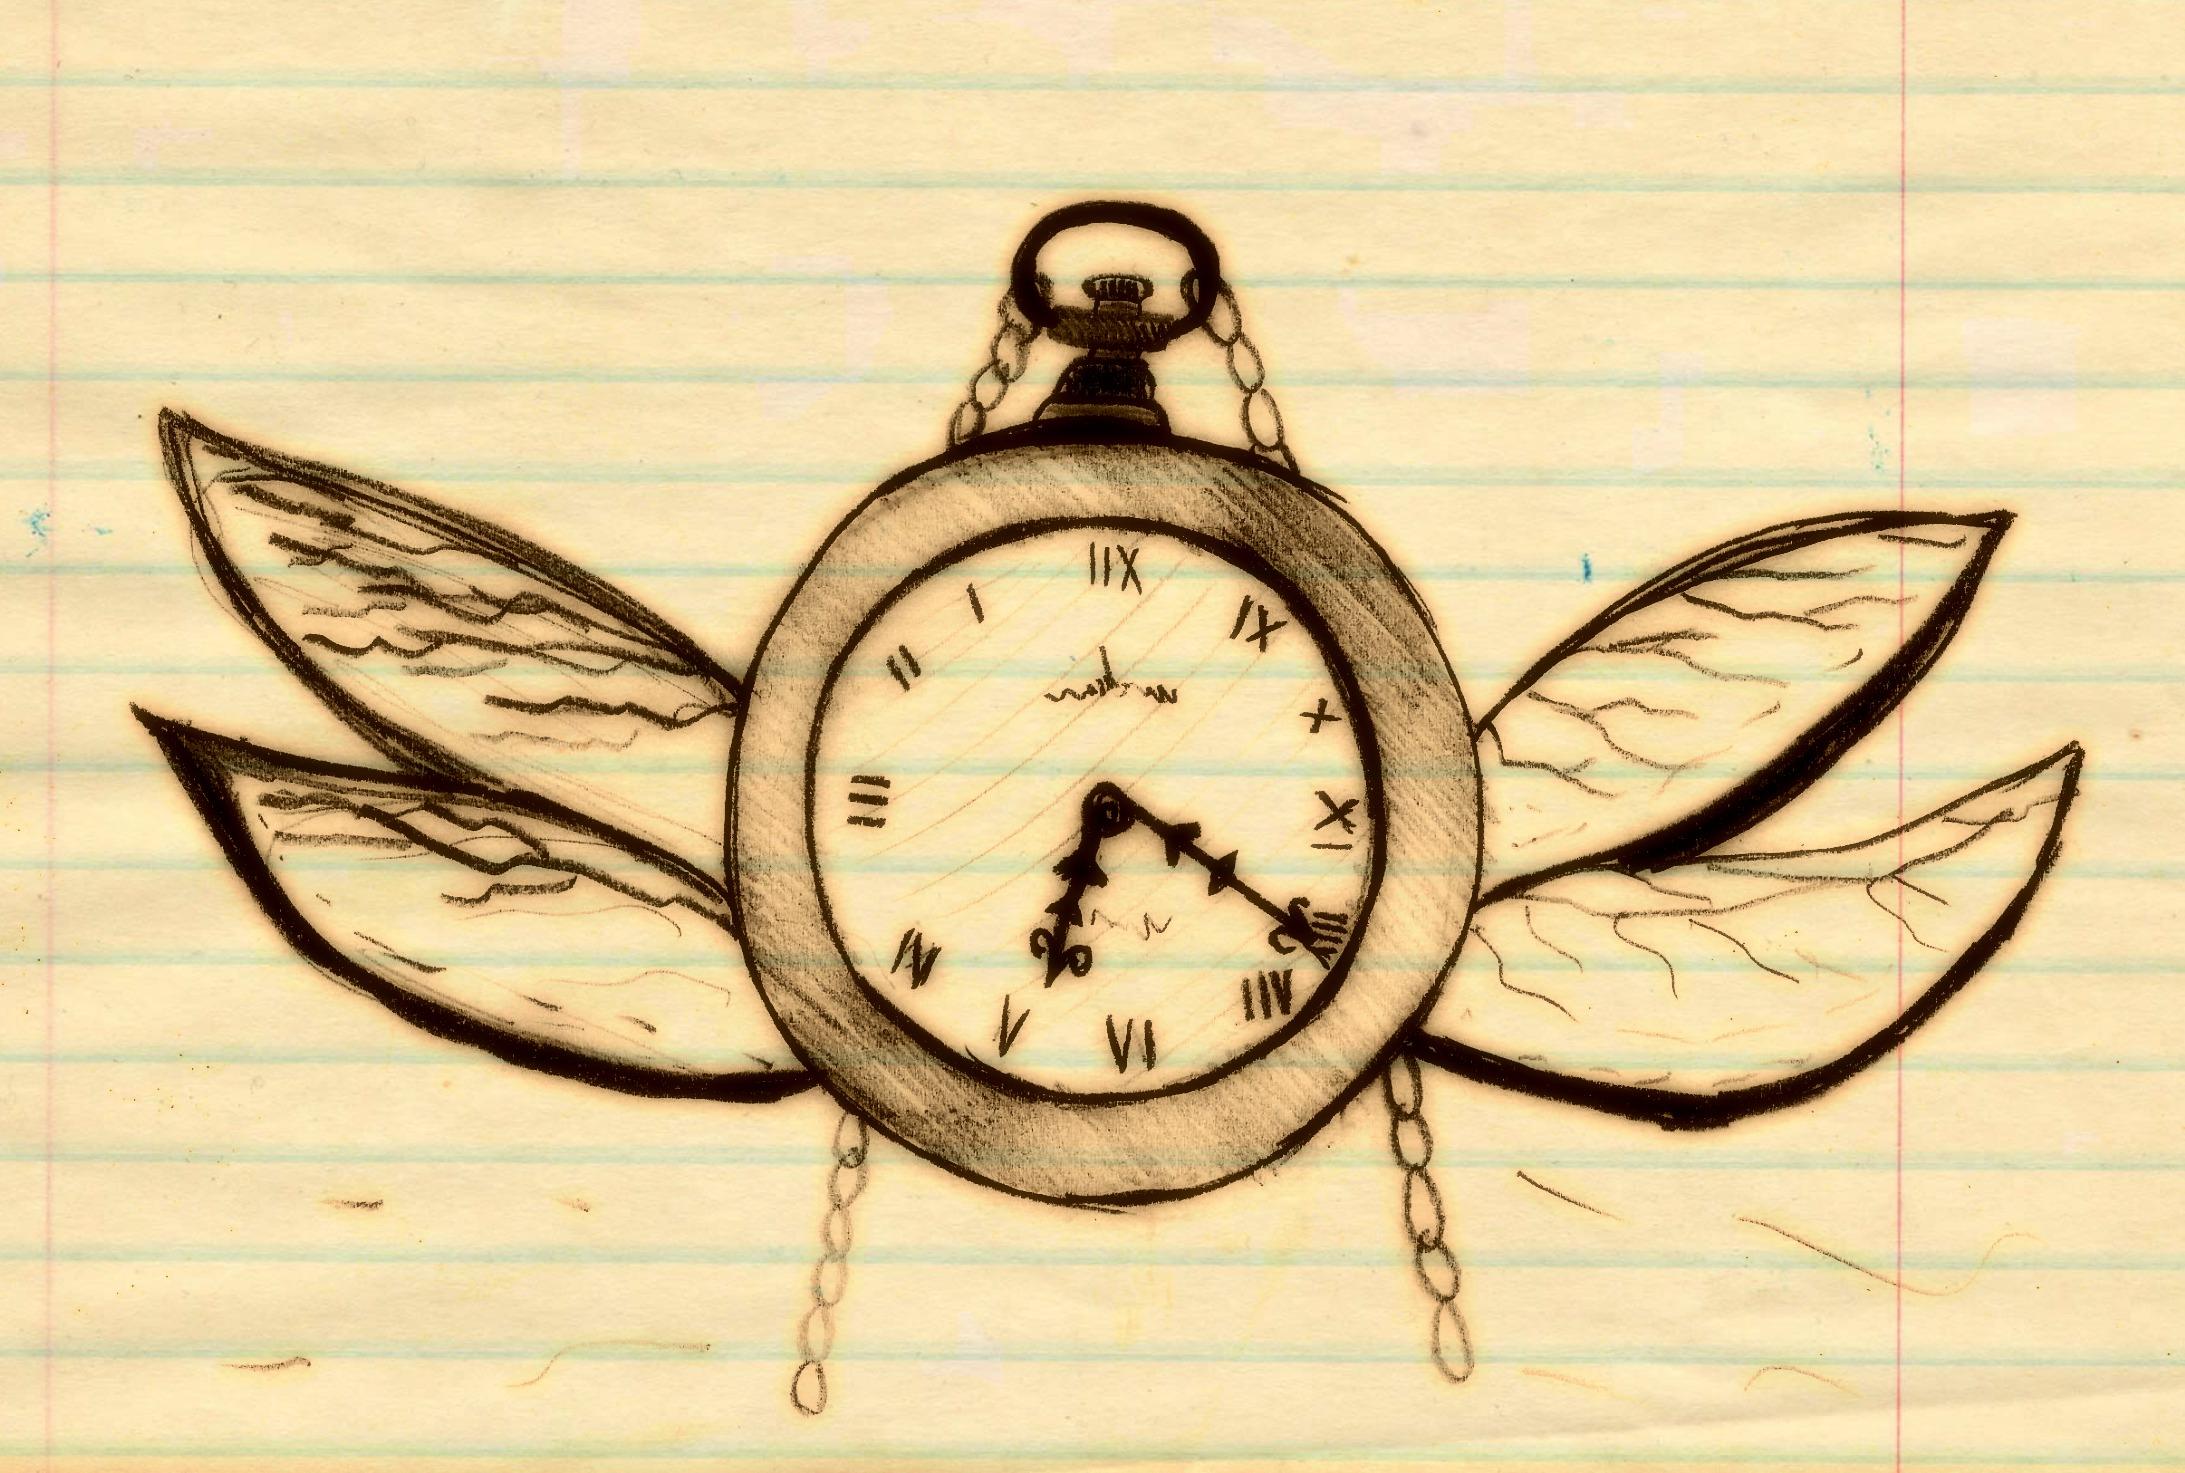 Dibujo alegórico: el tiempo se va volando